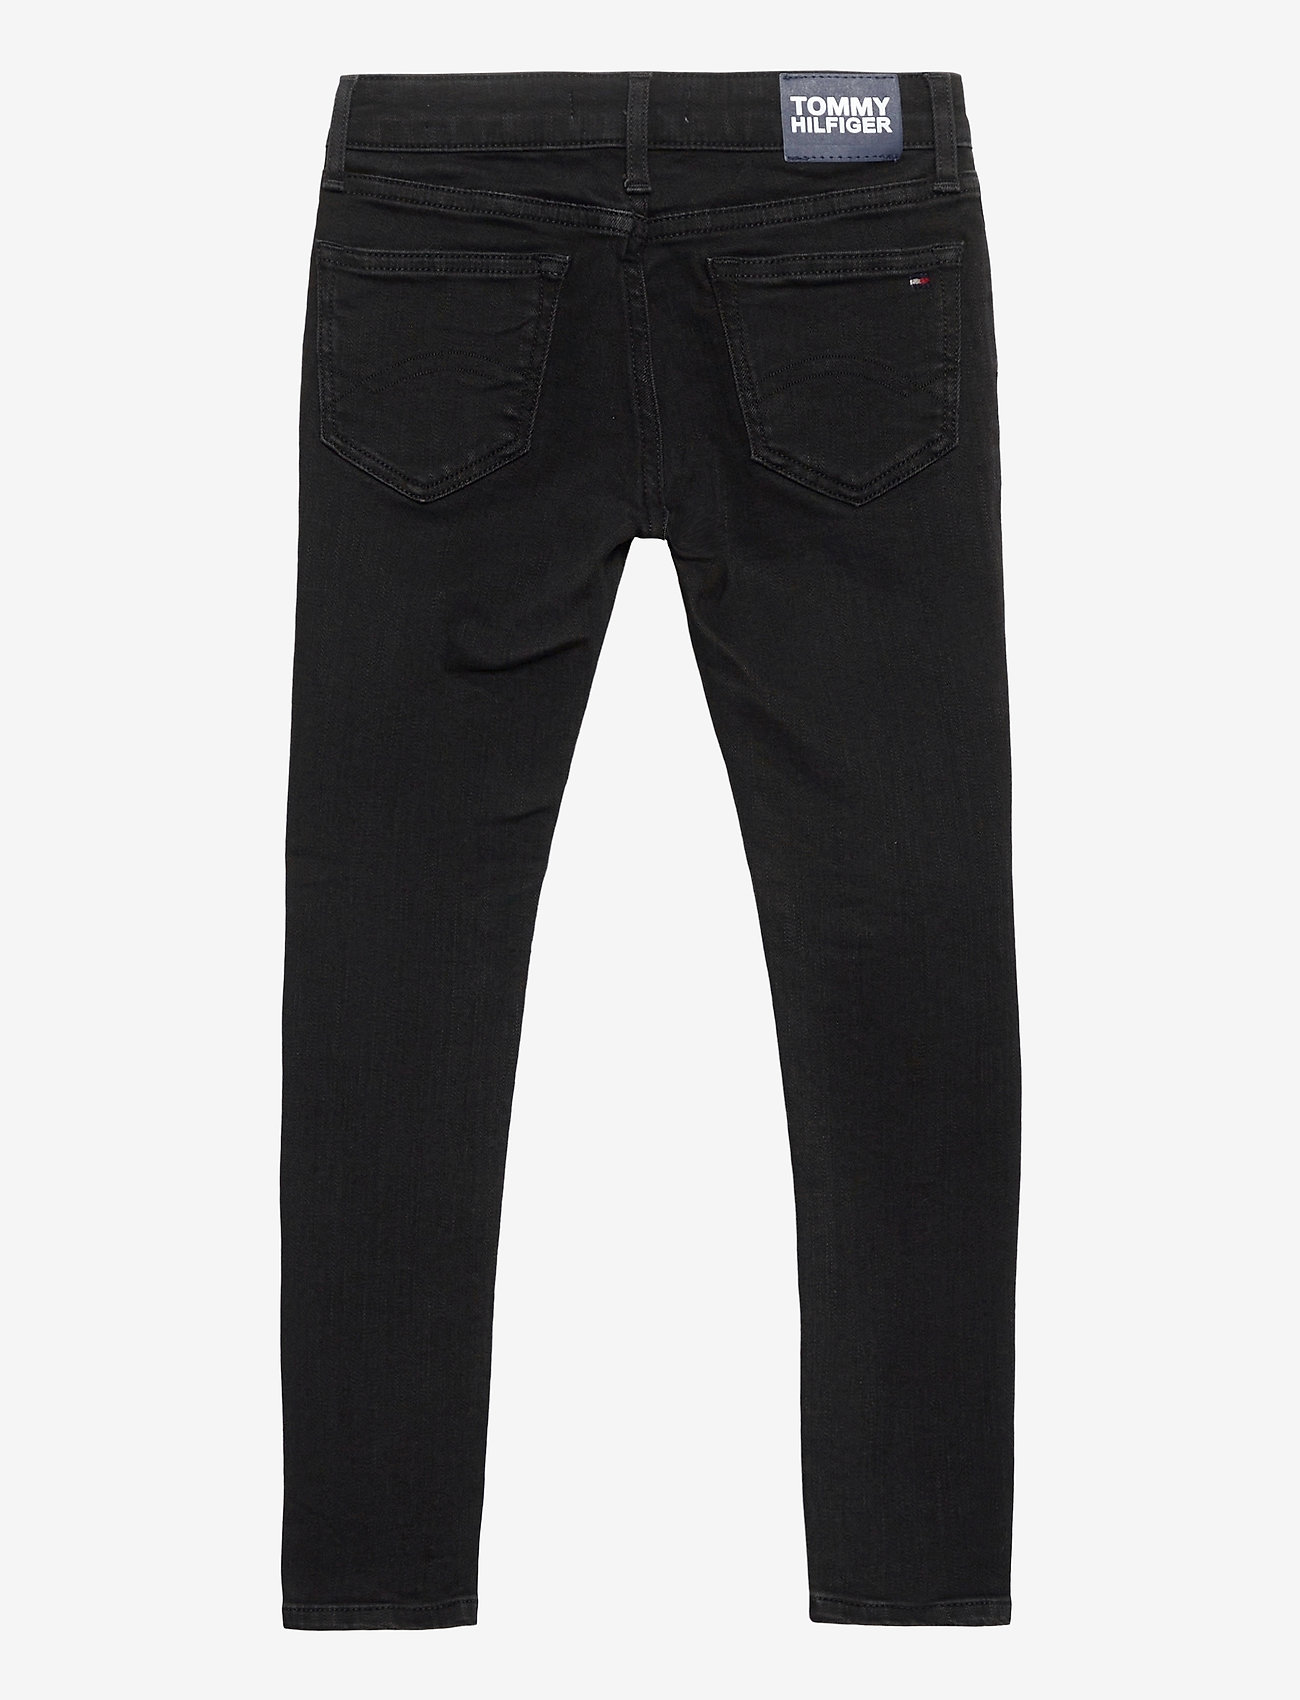 Tommy Hilfiger - NORA SUPER SKINNY WREPLBLS - jeans - waterrepellentblackstr - 1